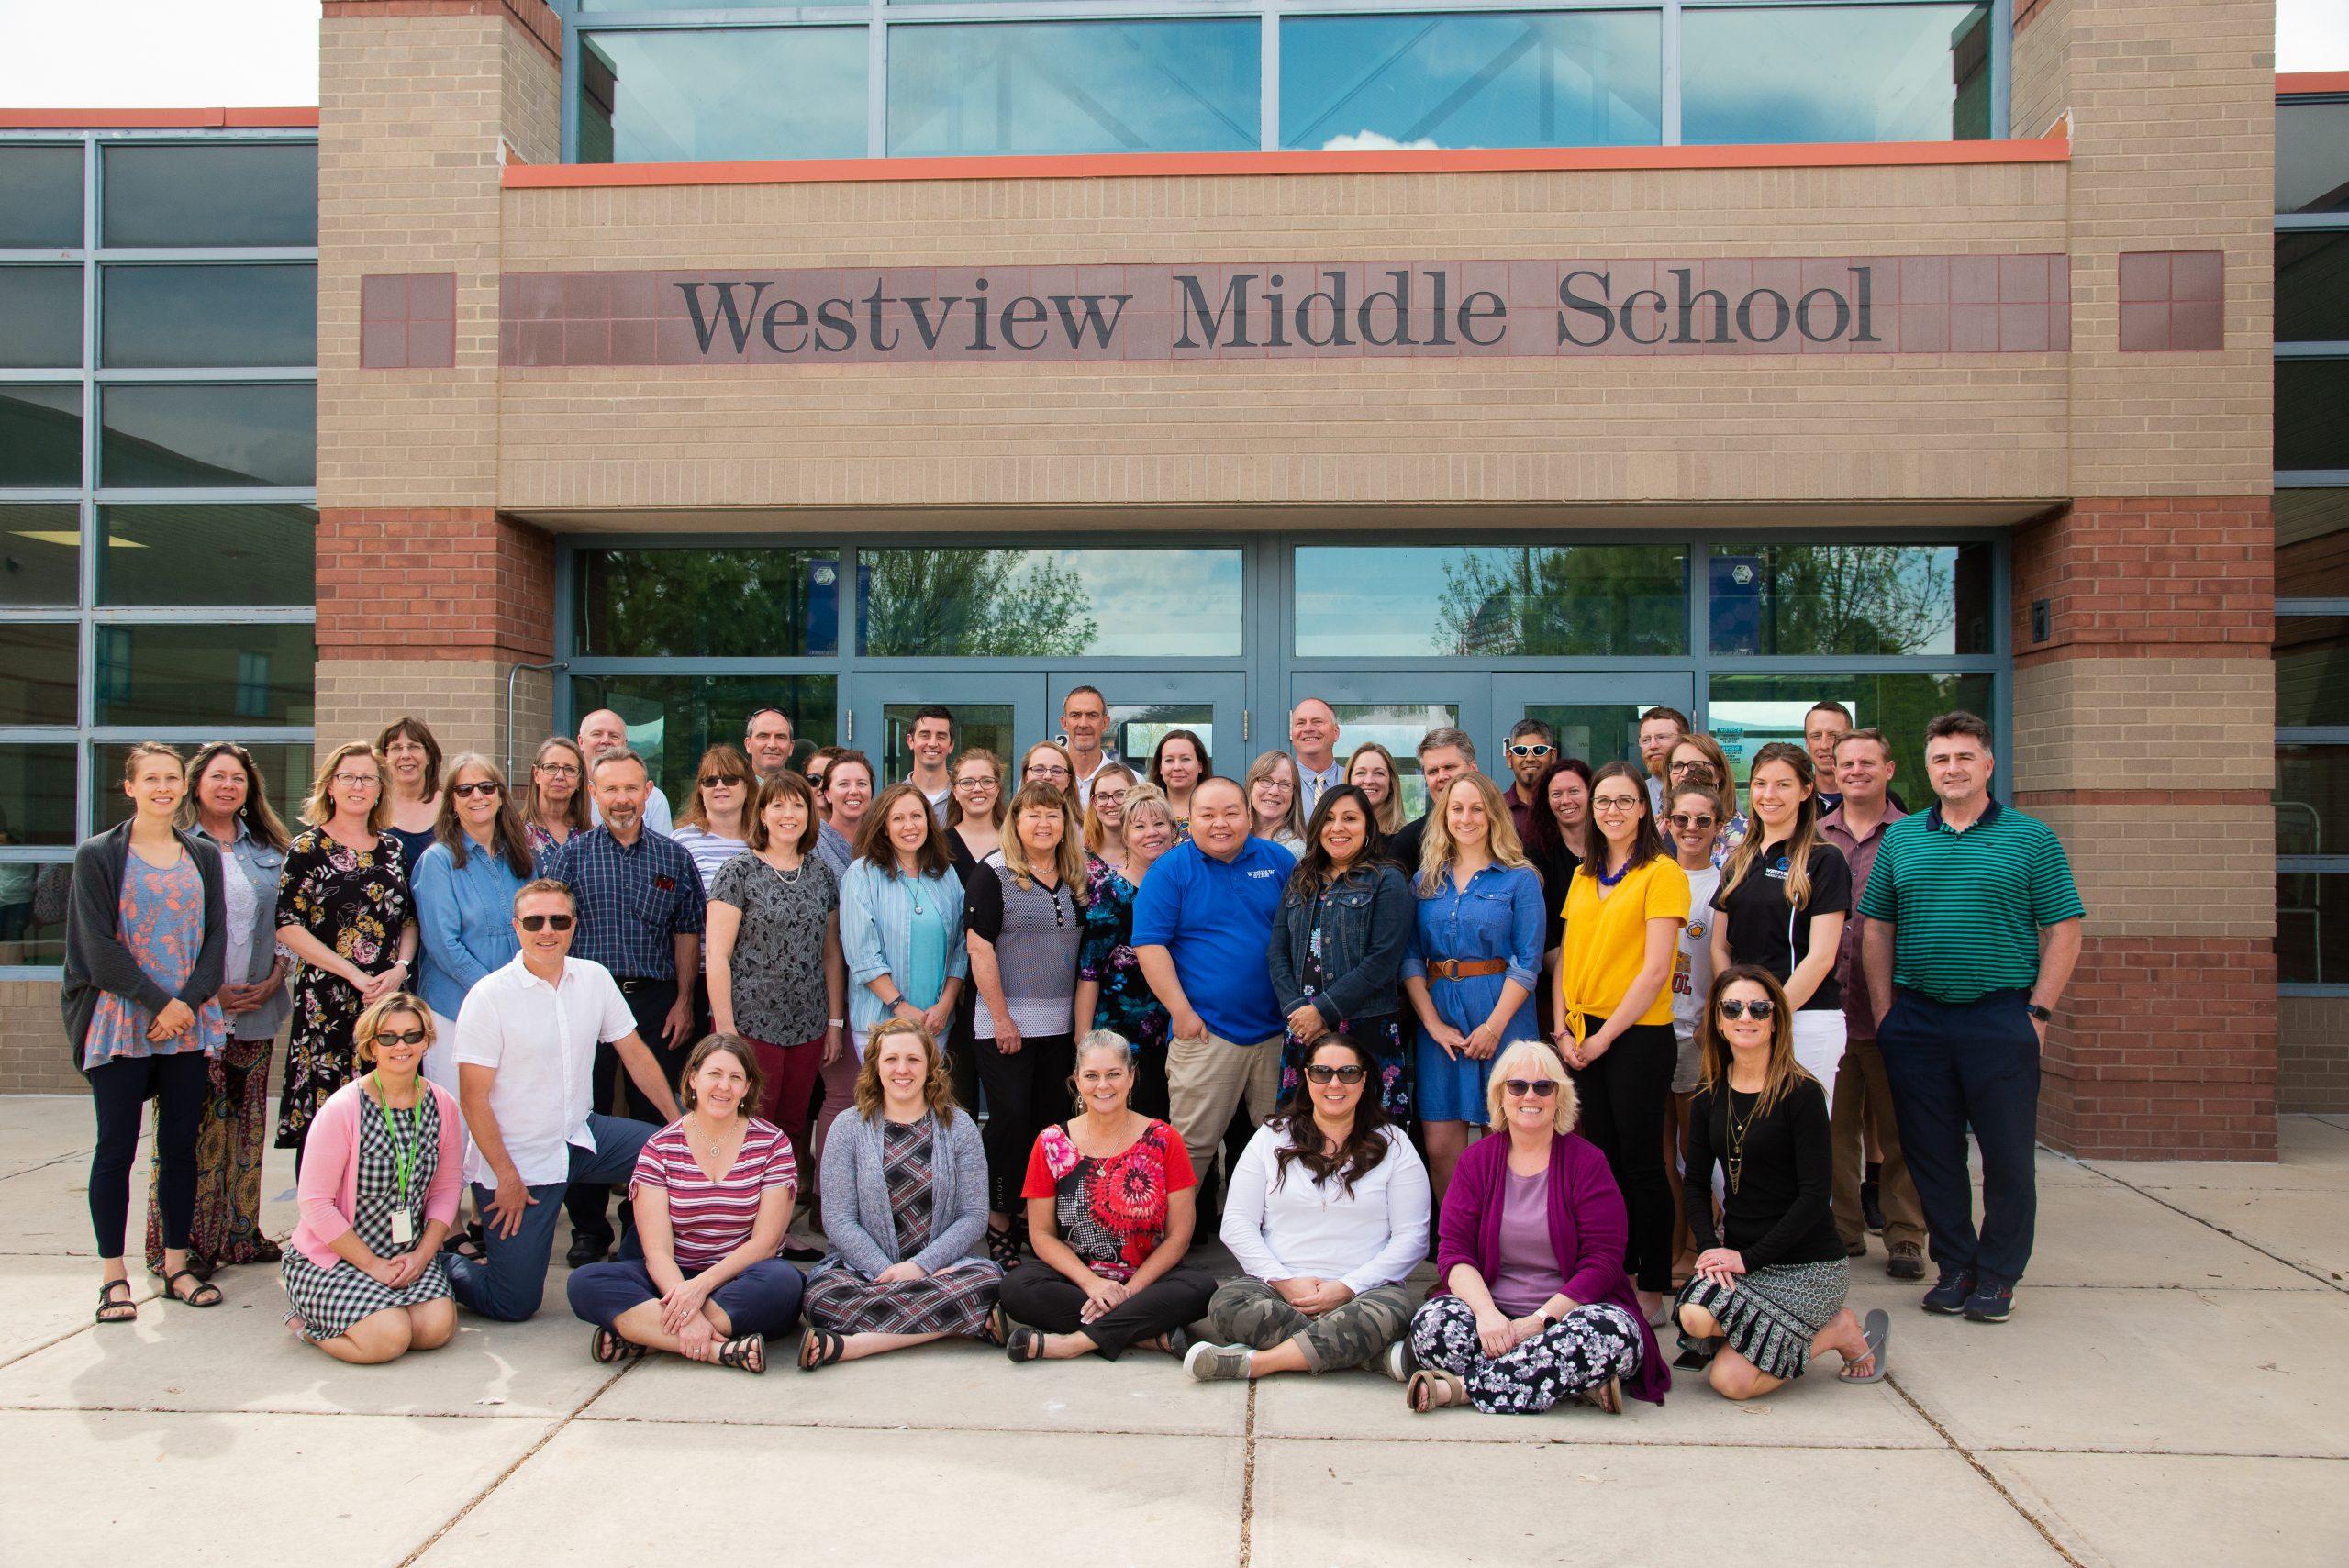 Westview Middle School Staff